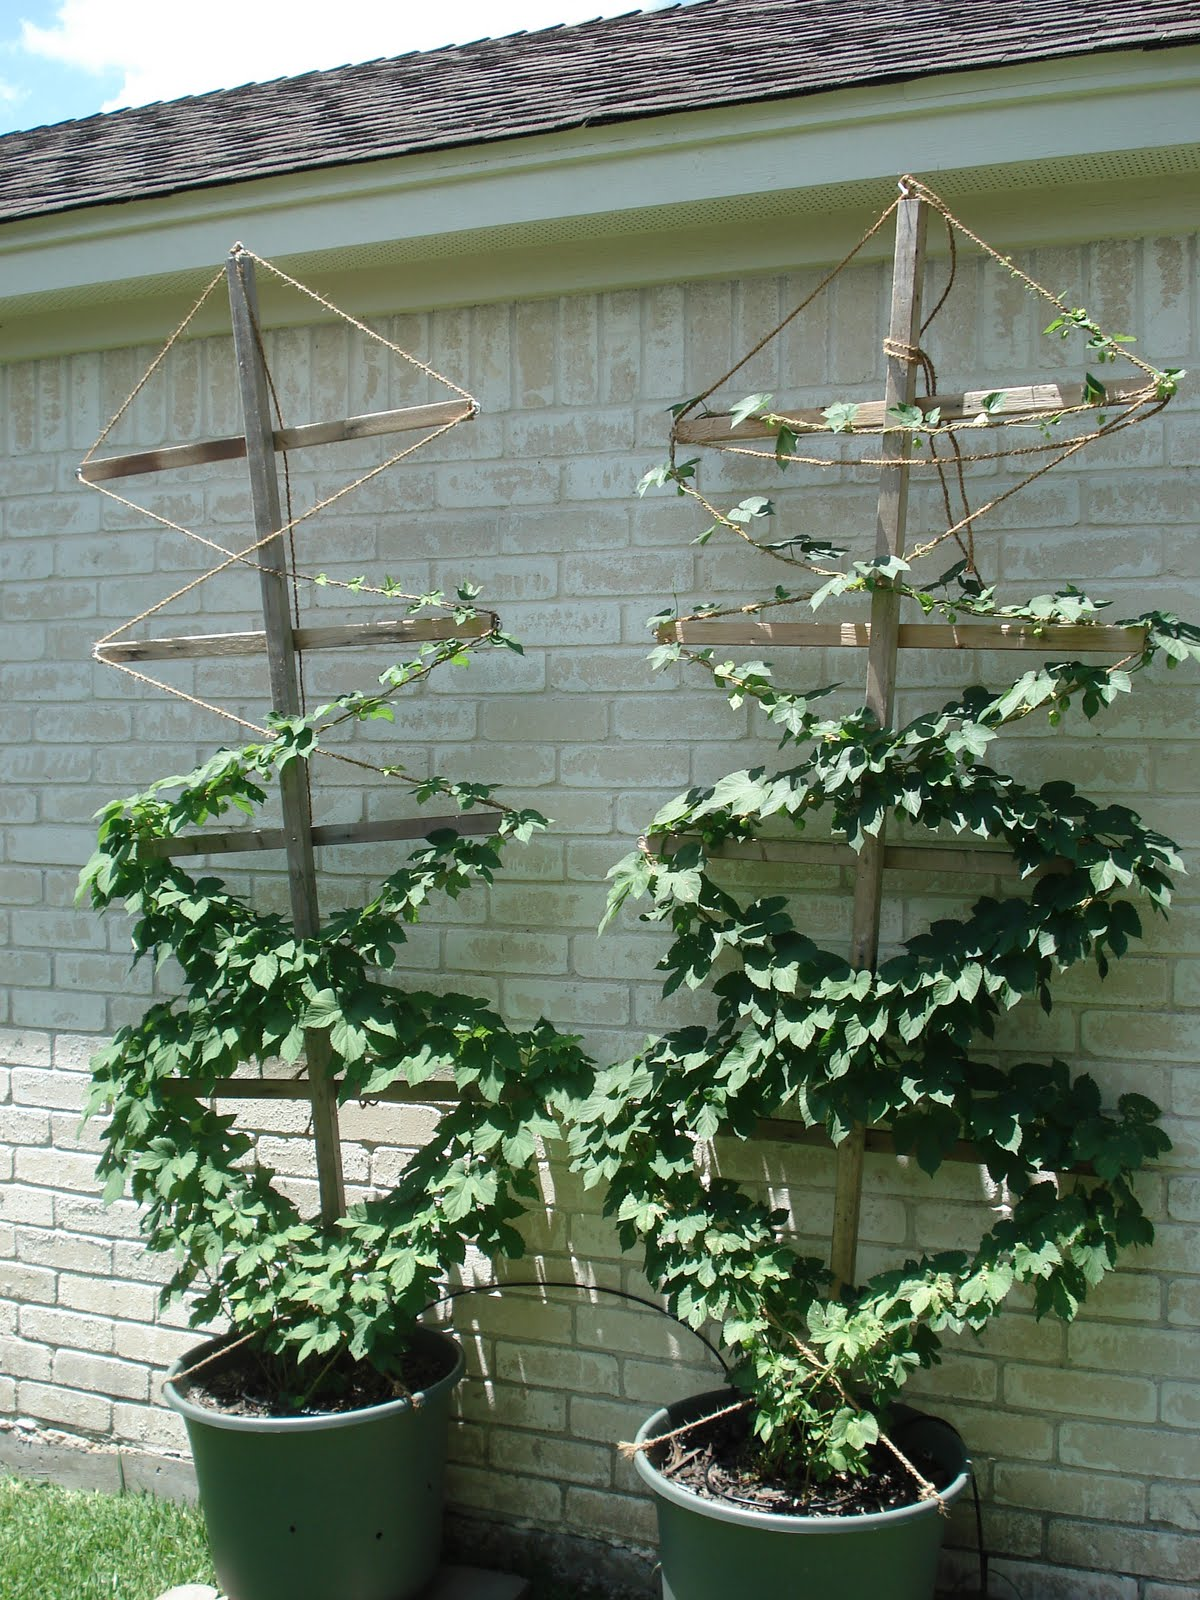 Hops in pots hop cones on both plants for Hops garden designs